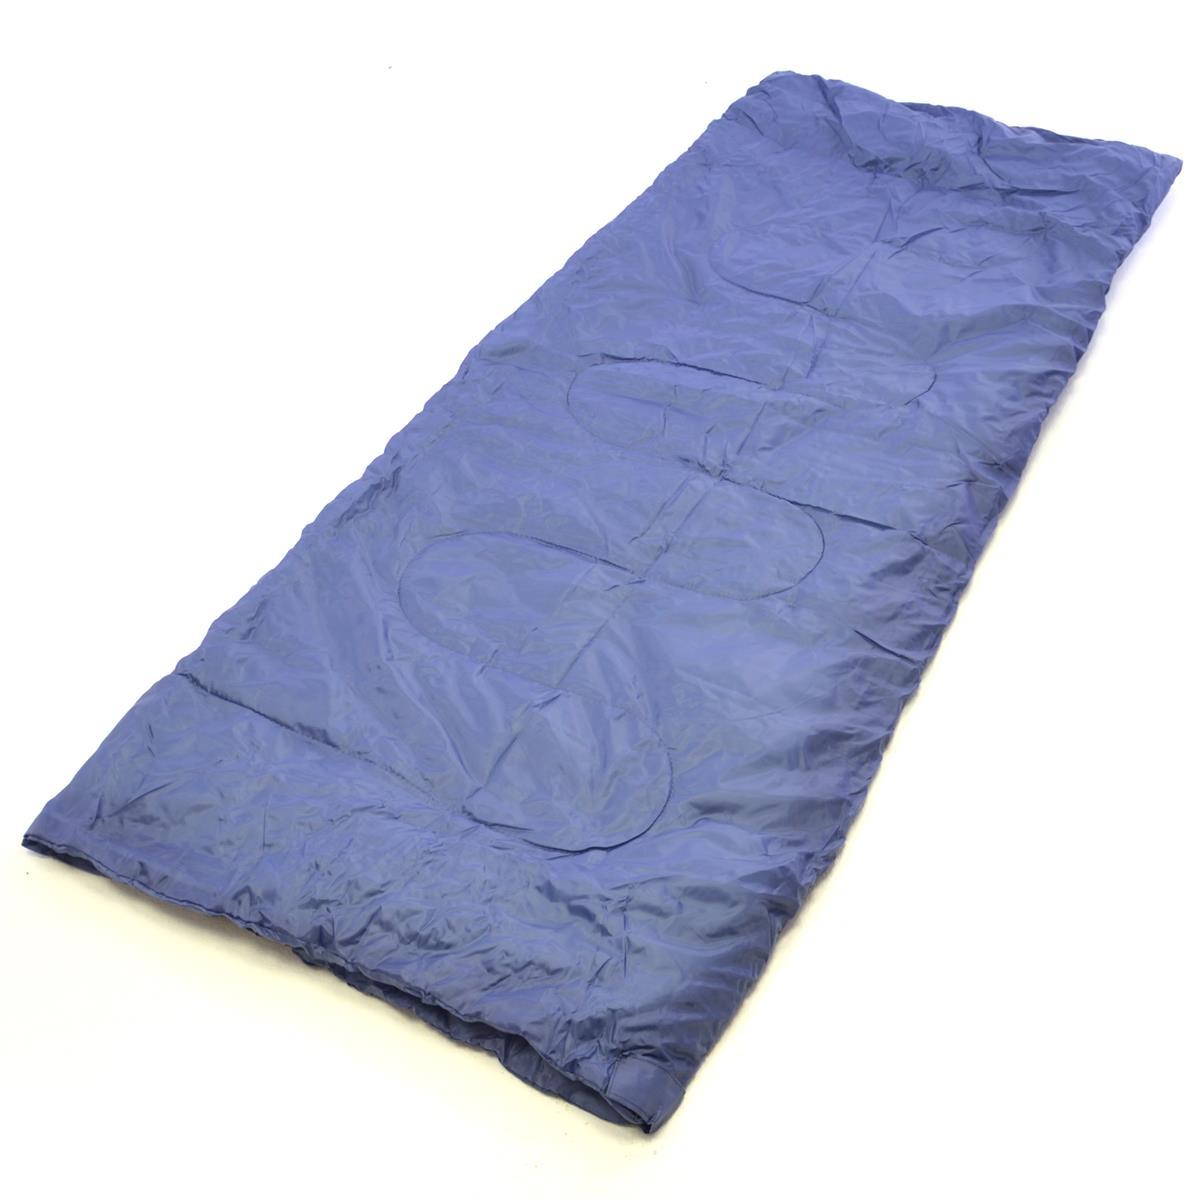 Schlafsack Karpala 190 cm 170T Polyester blaugrau 150g/m² 15-25°C Decke Camping